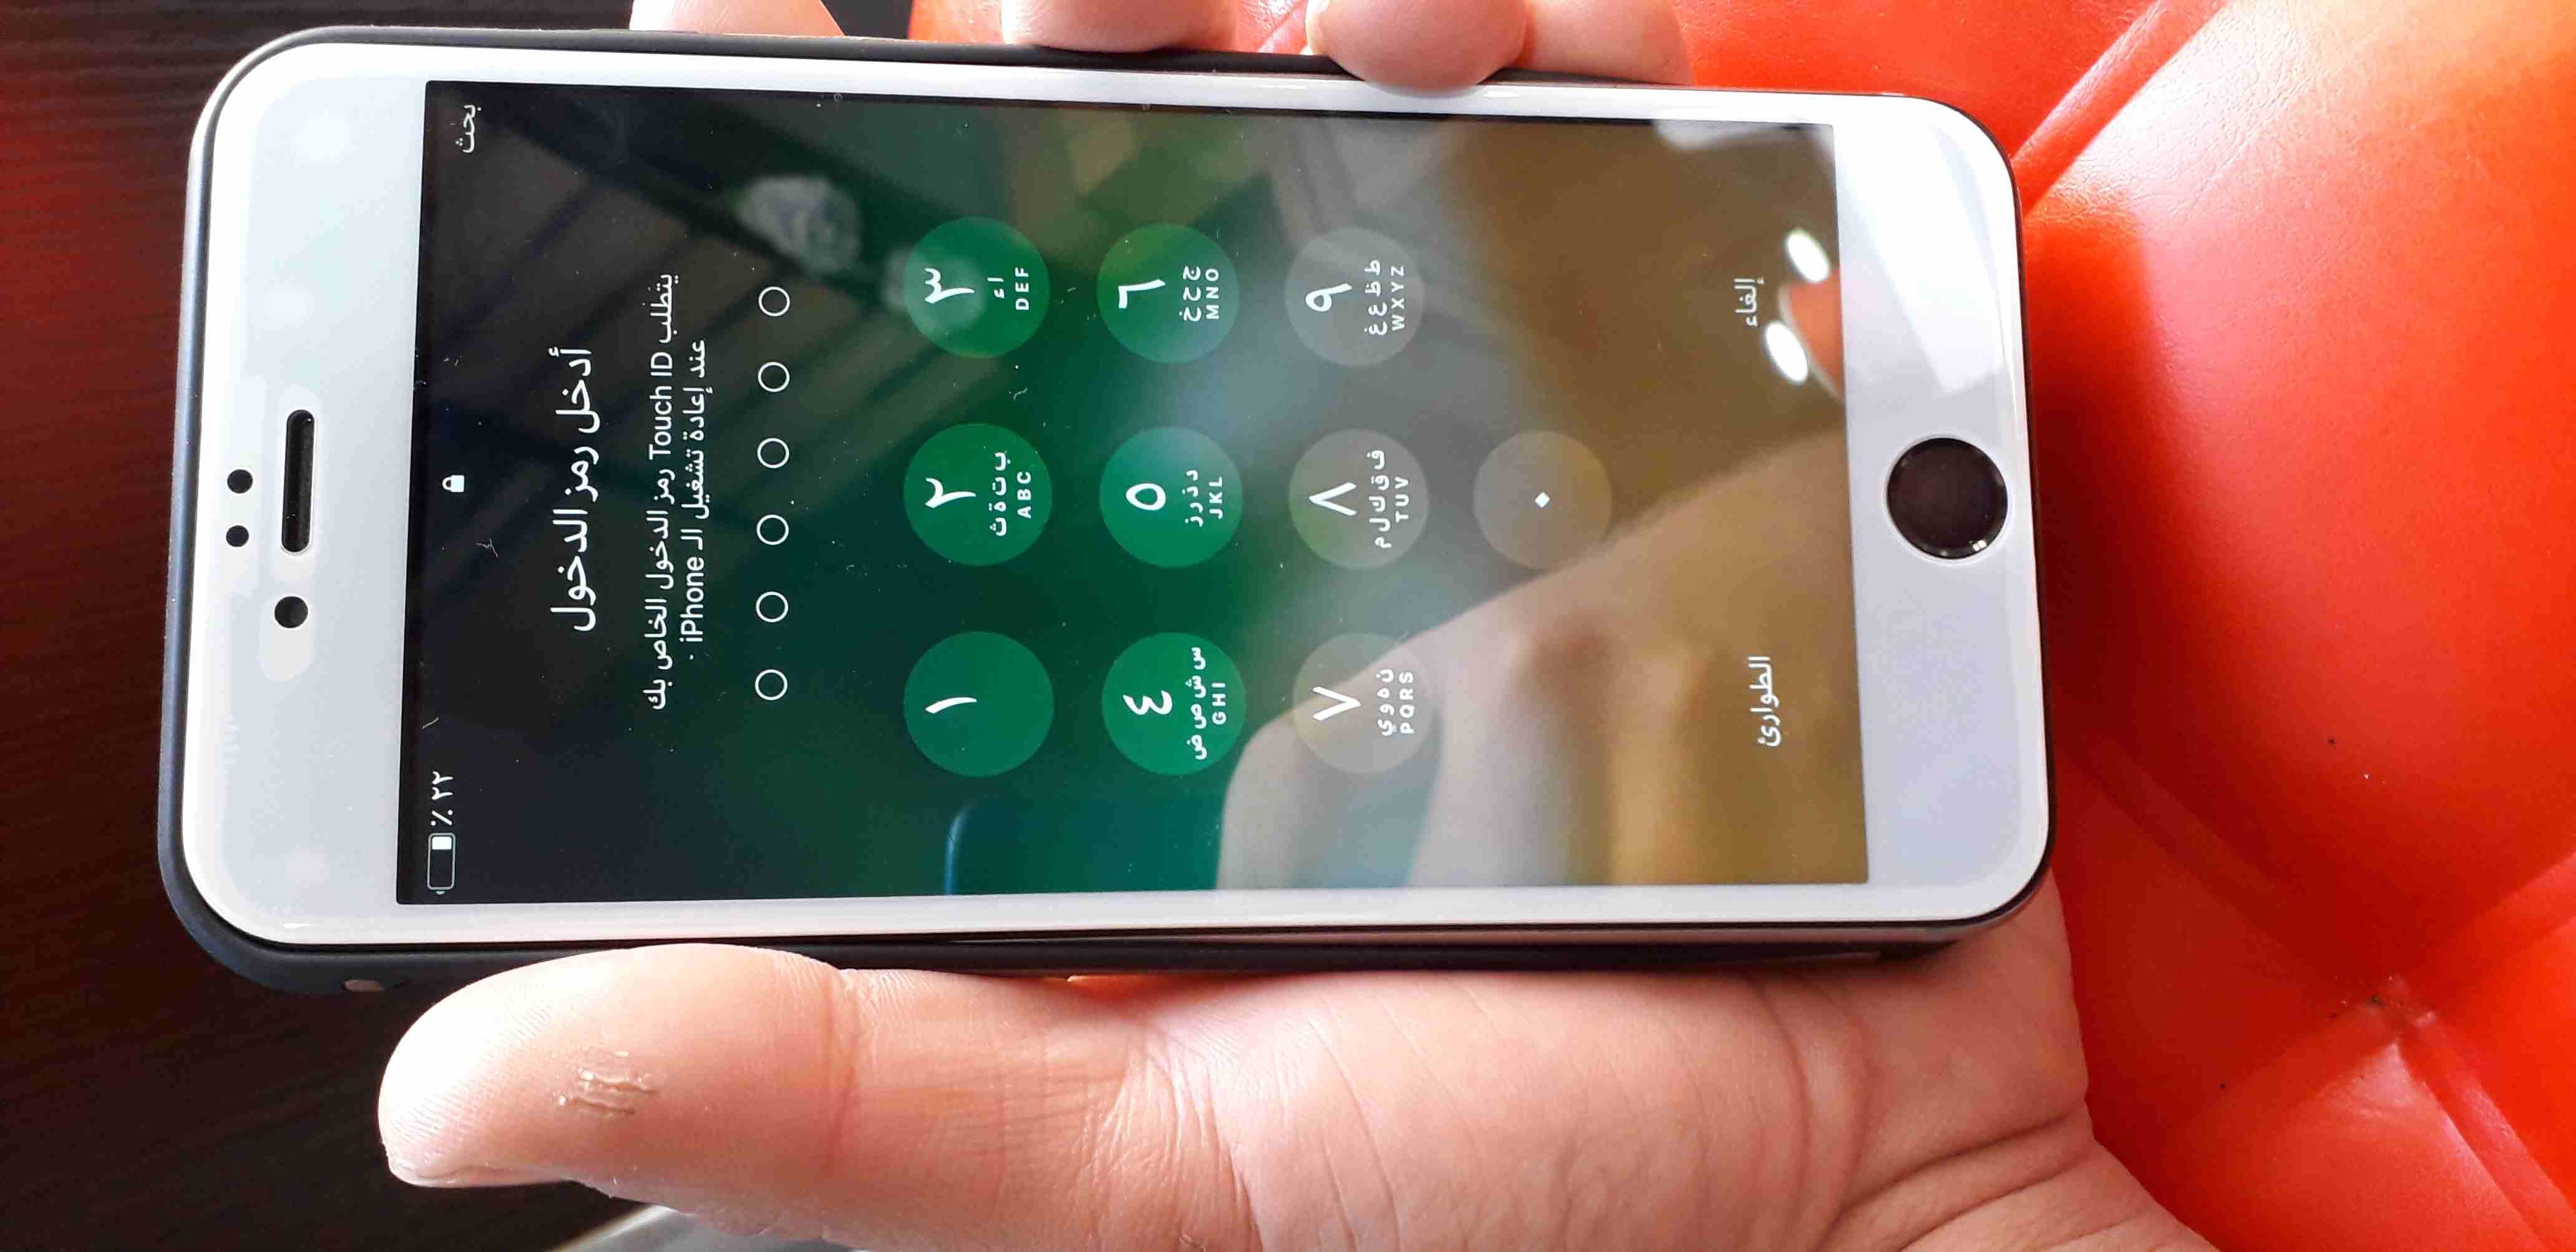 ايفون اكس اس XS مستعمل خفيف جدا ب 2000 درهم كاش-  IPhone 6 plus لا تنسَ أنك...